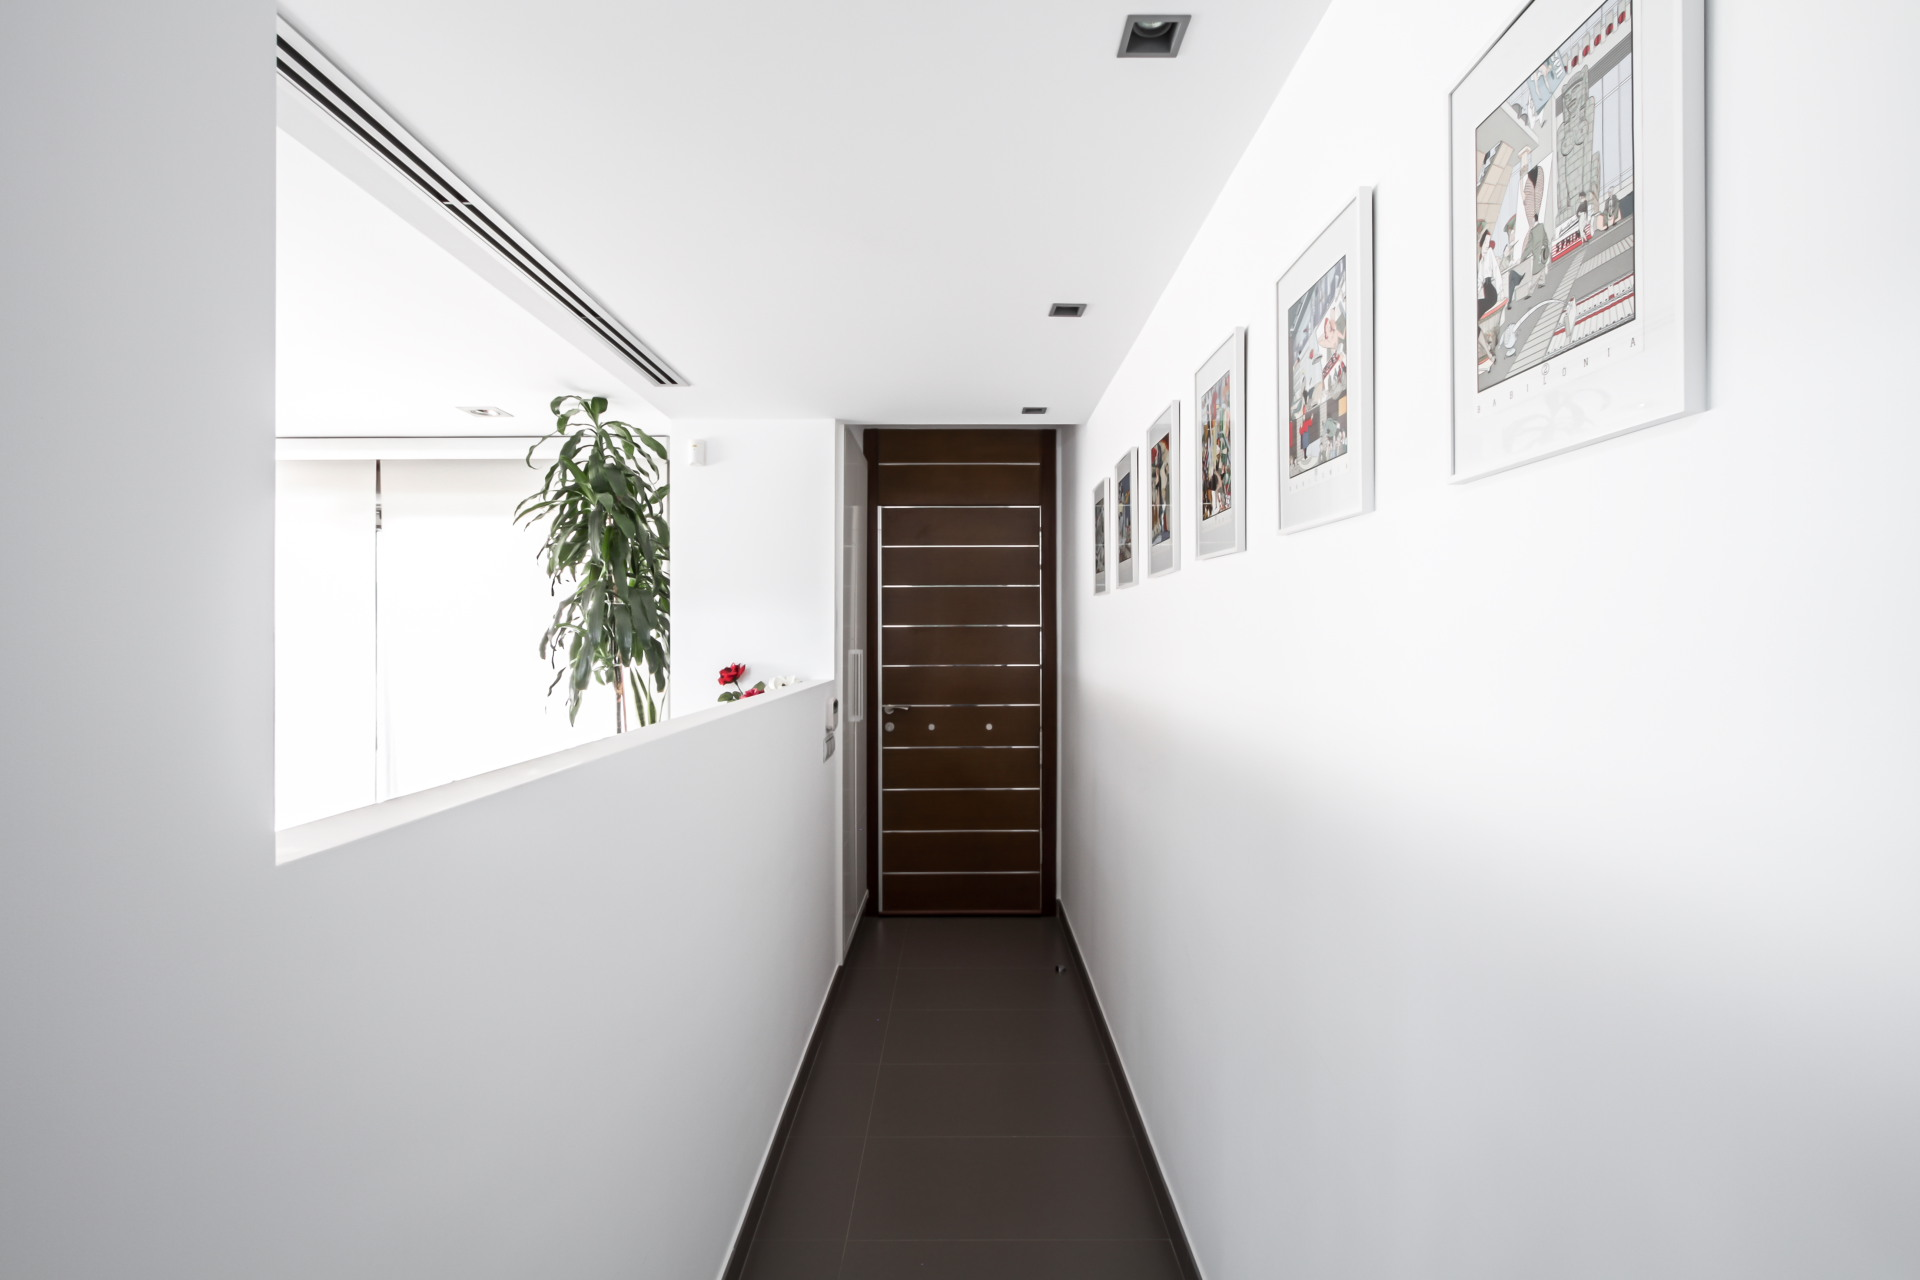 fotografia-arquitectura-valencia-german-cabo-viraje-v02 (6)